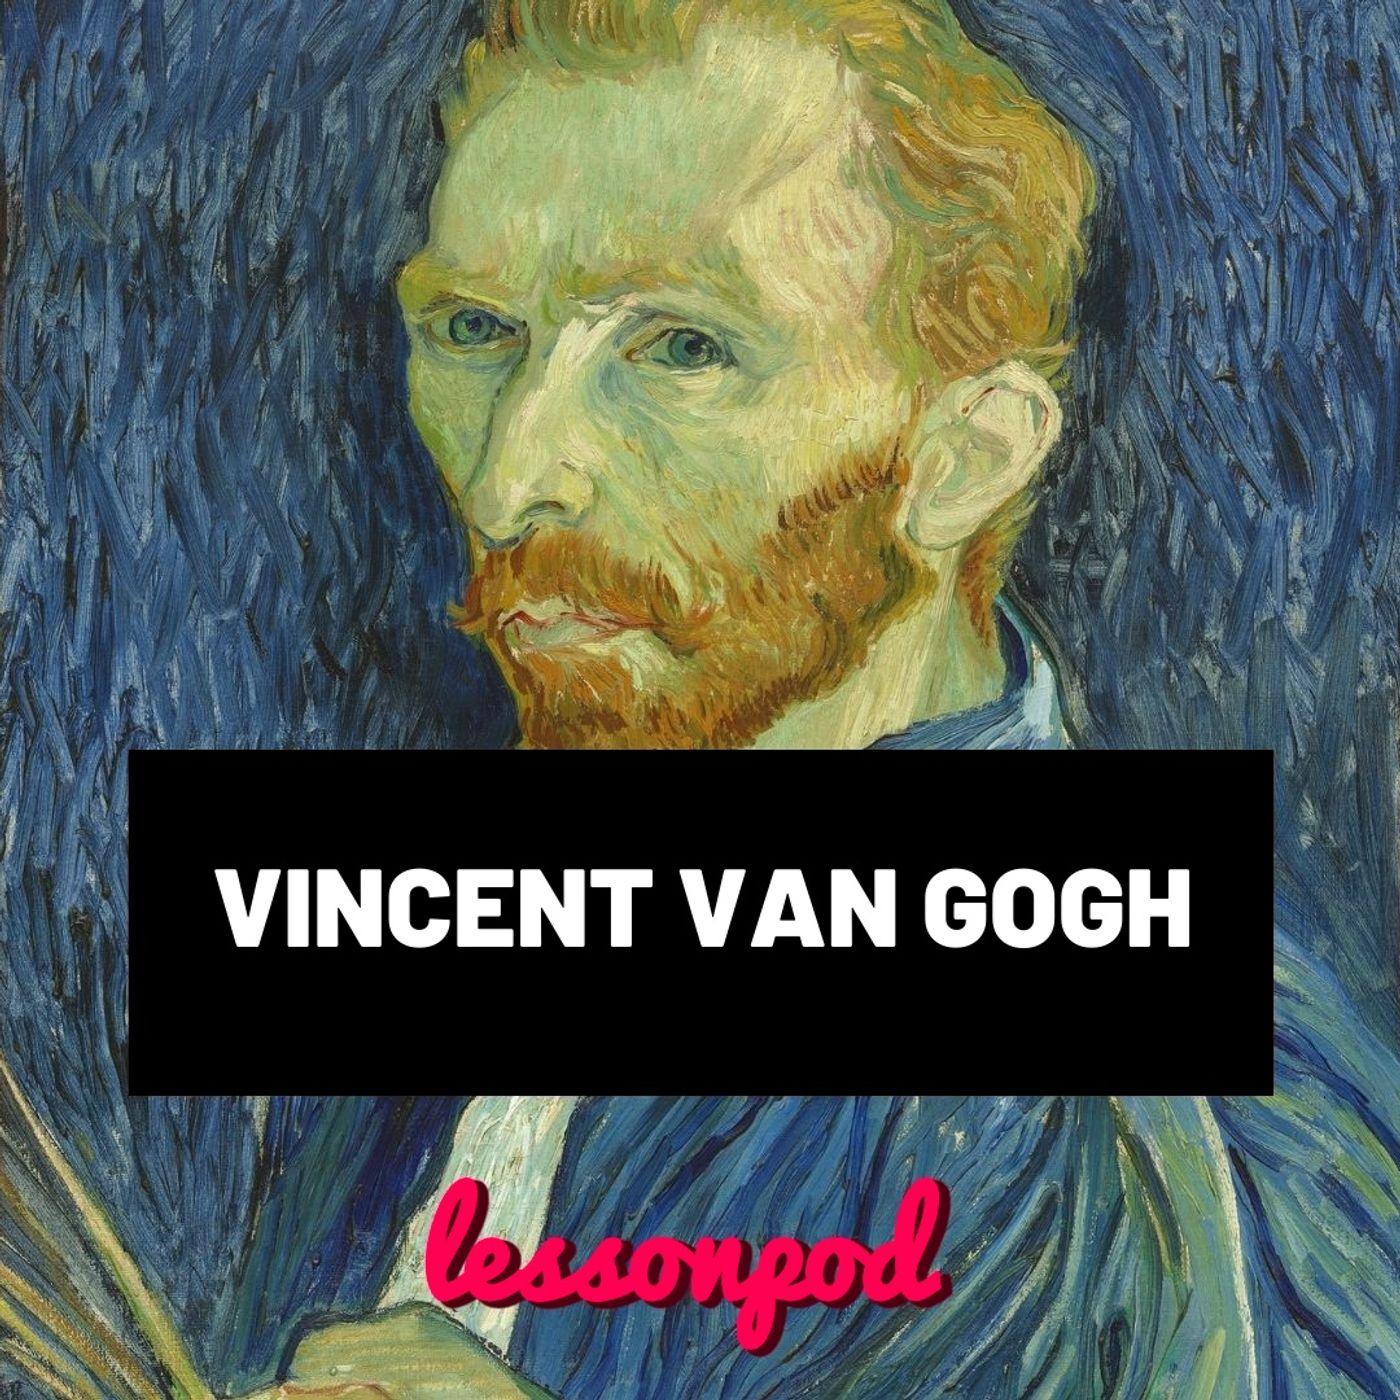 La tormentata vita di Vincent Van Gogh in 13 minuti